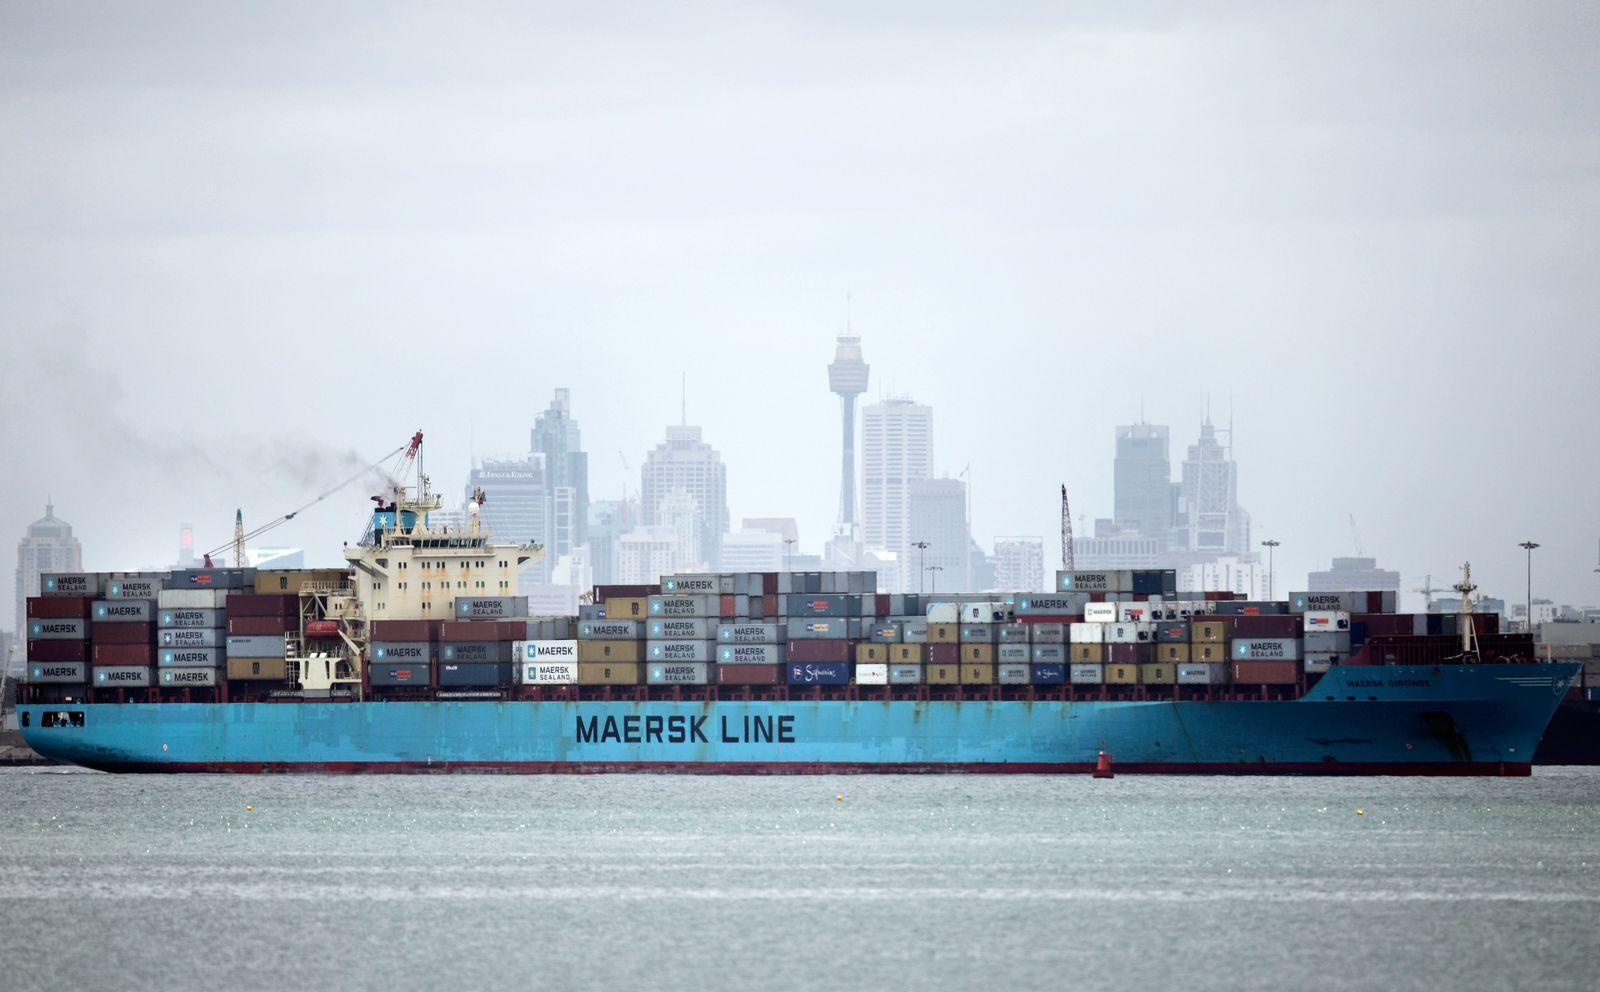 Australien / Import / Export / Konjunktur / Hafen / Cintainer